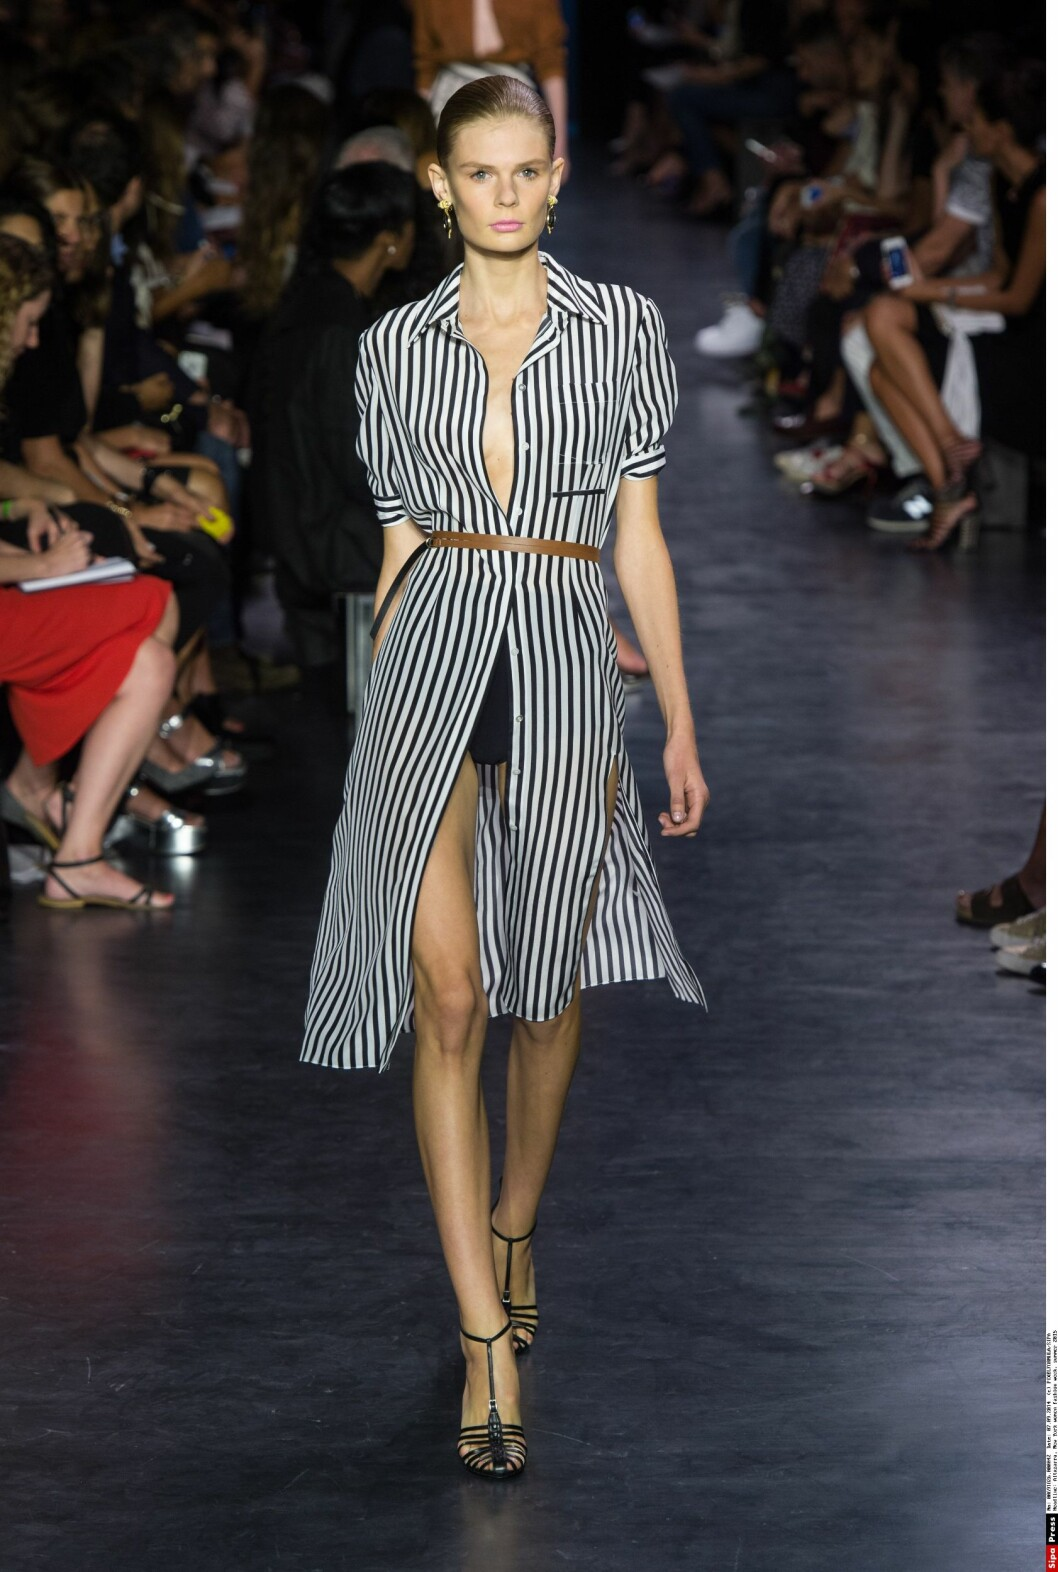 STRIPER. Altuzarras skjortekjole vist på New York fashion week skiller seg ikke så allverdens fra ... Foto: PIXELFORMULA/SIPA/All Over Press